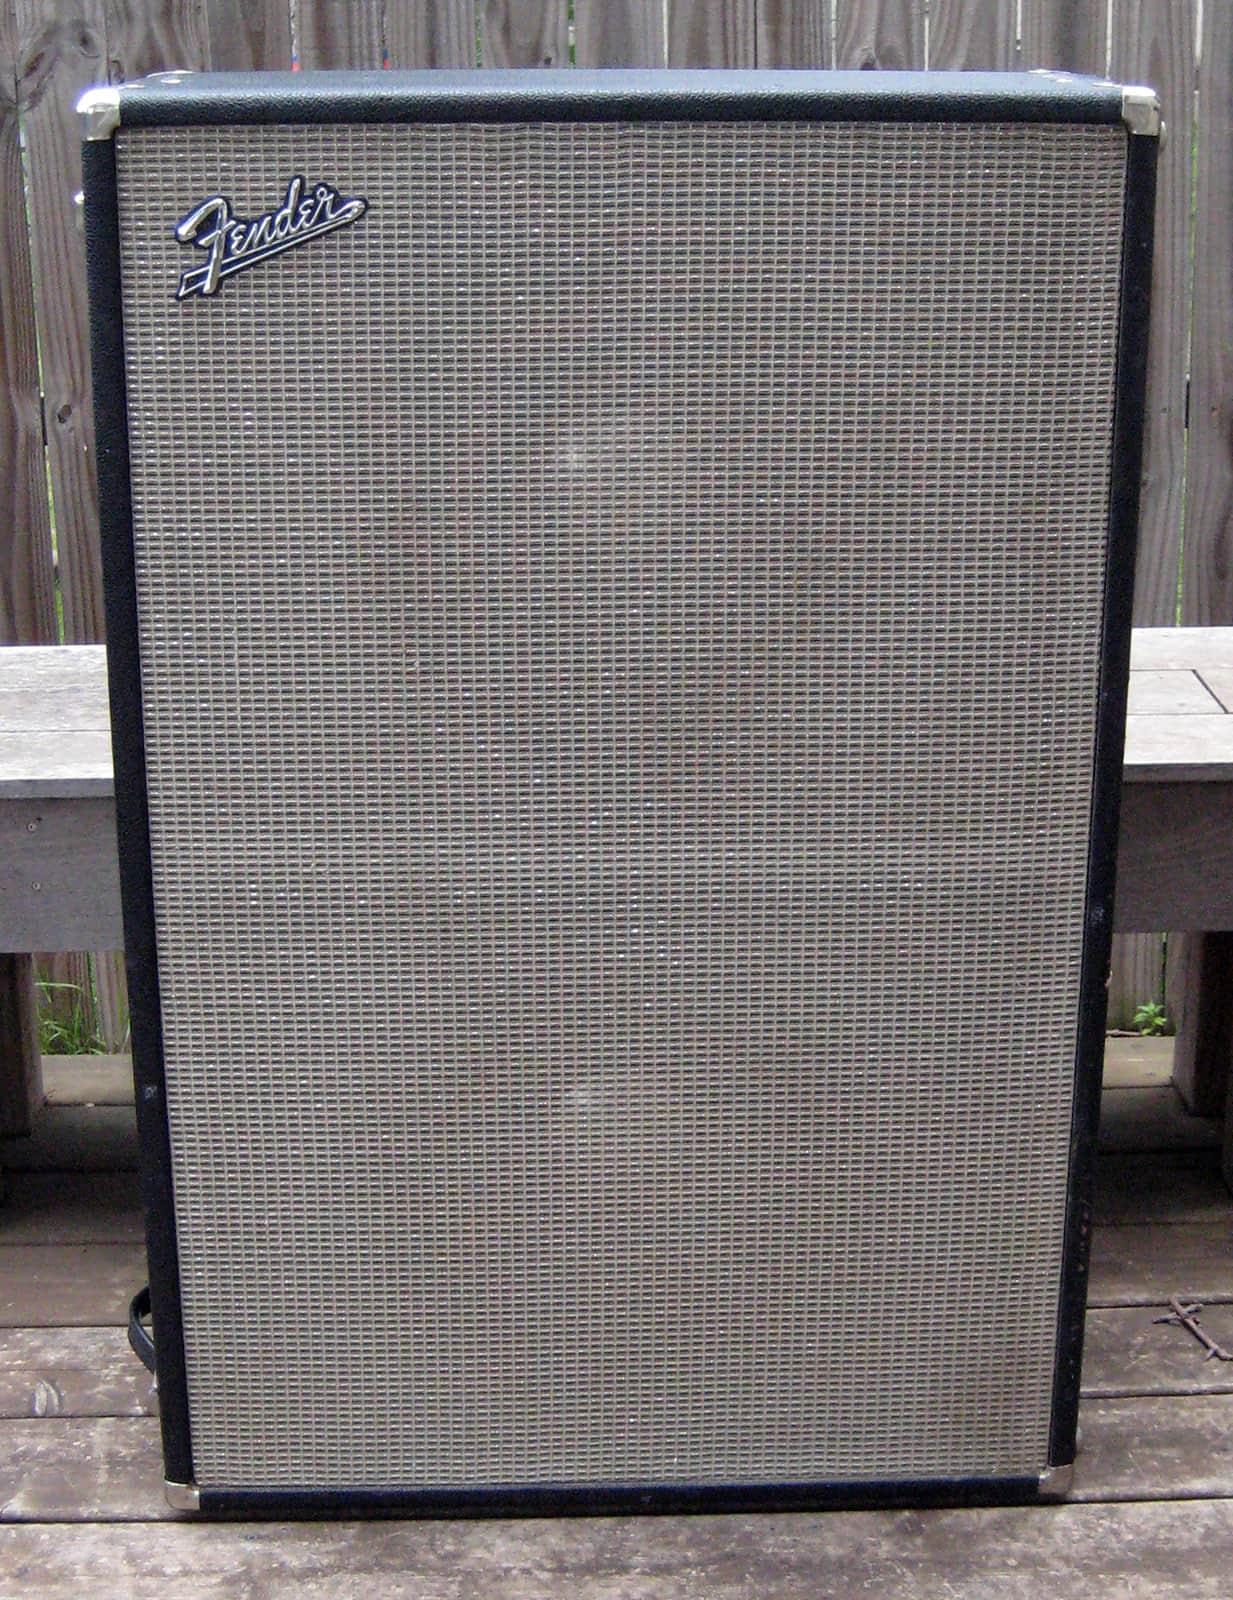 Vintage Late 1960s Fender Bassman 2x15 Quot Cabinet Jbl